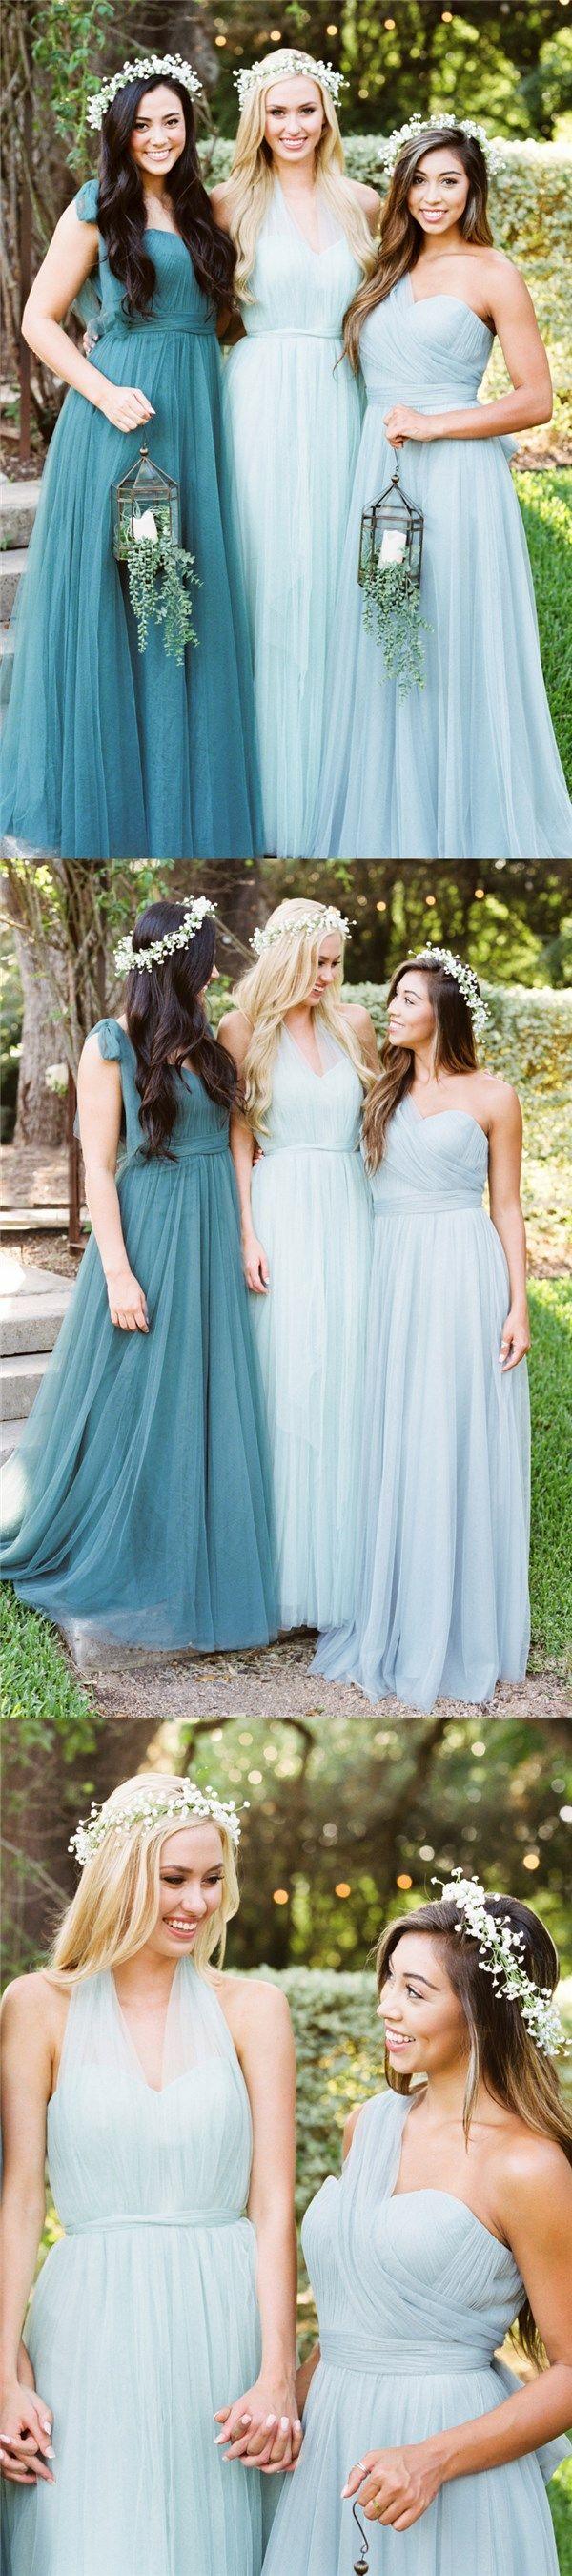 New Arrival Formal Elegant Long Bridesmaid Dresses, Custom Popular Bridesmaid Dress,PD0344